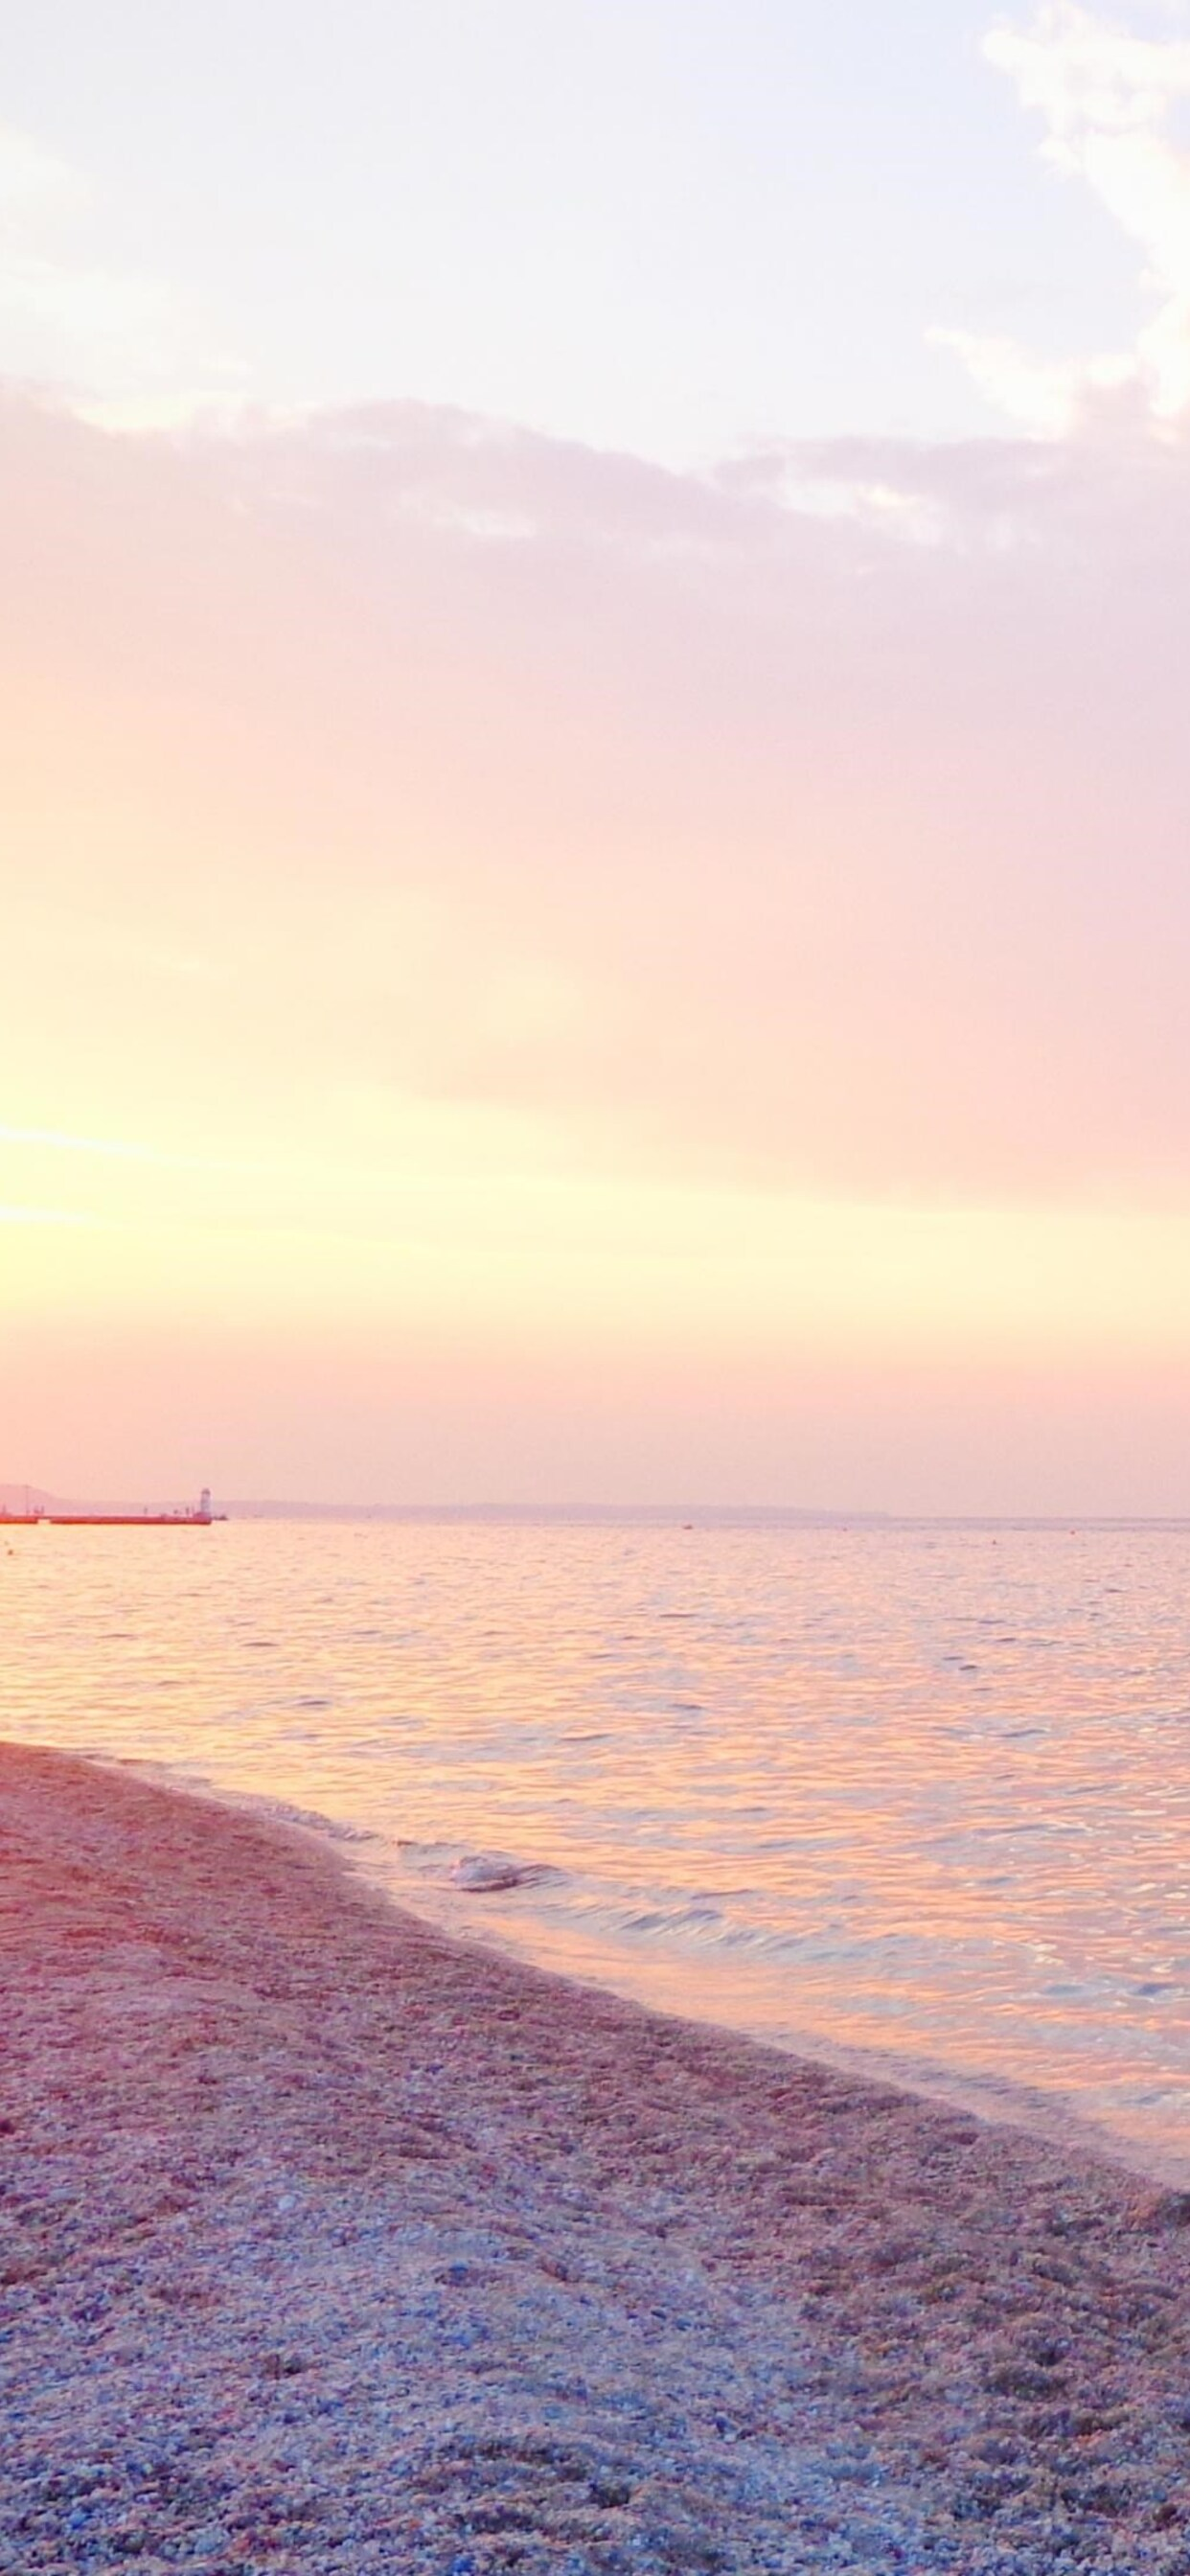 greece-sea-beach-sunset.jpg